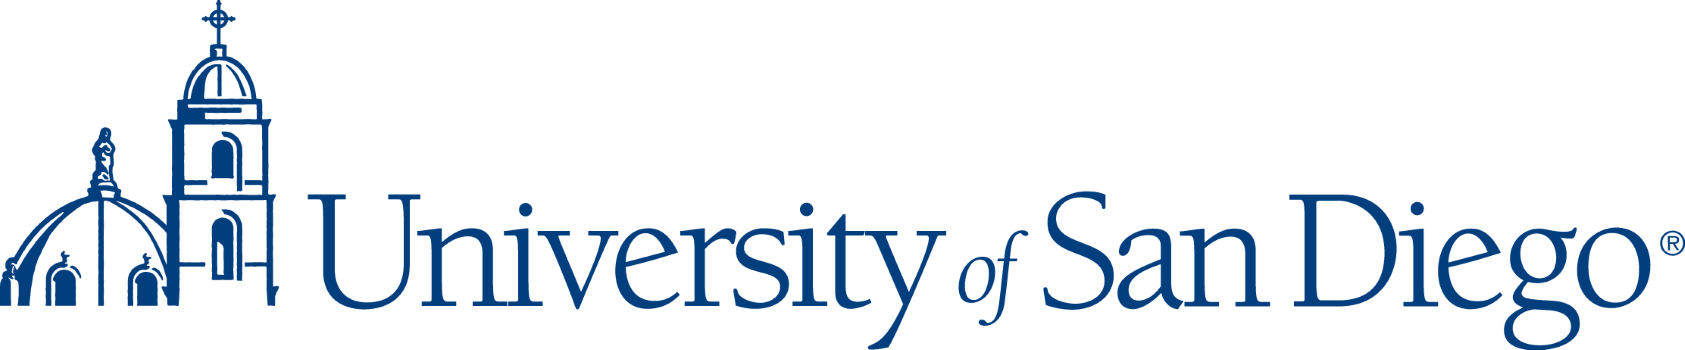 University of San Diego Banner